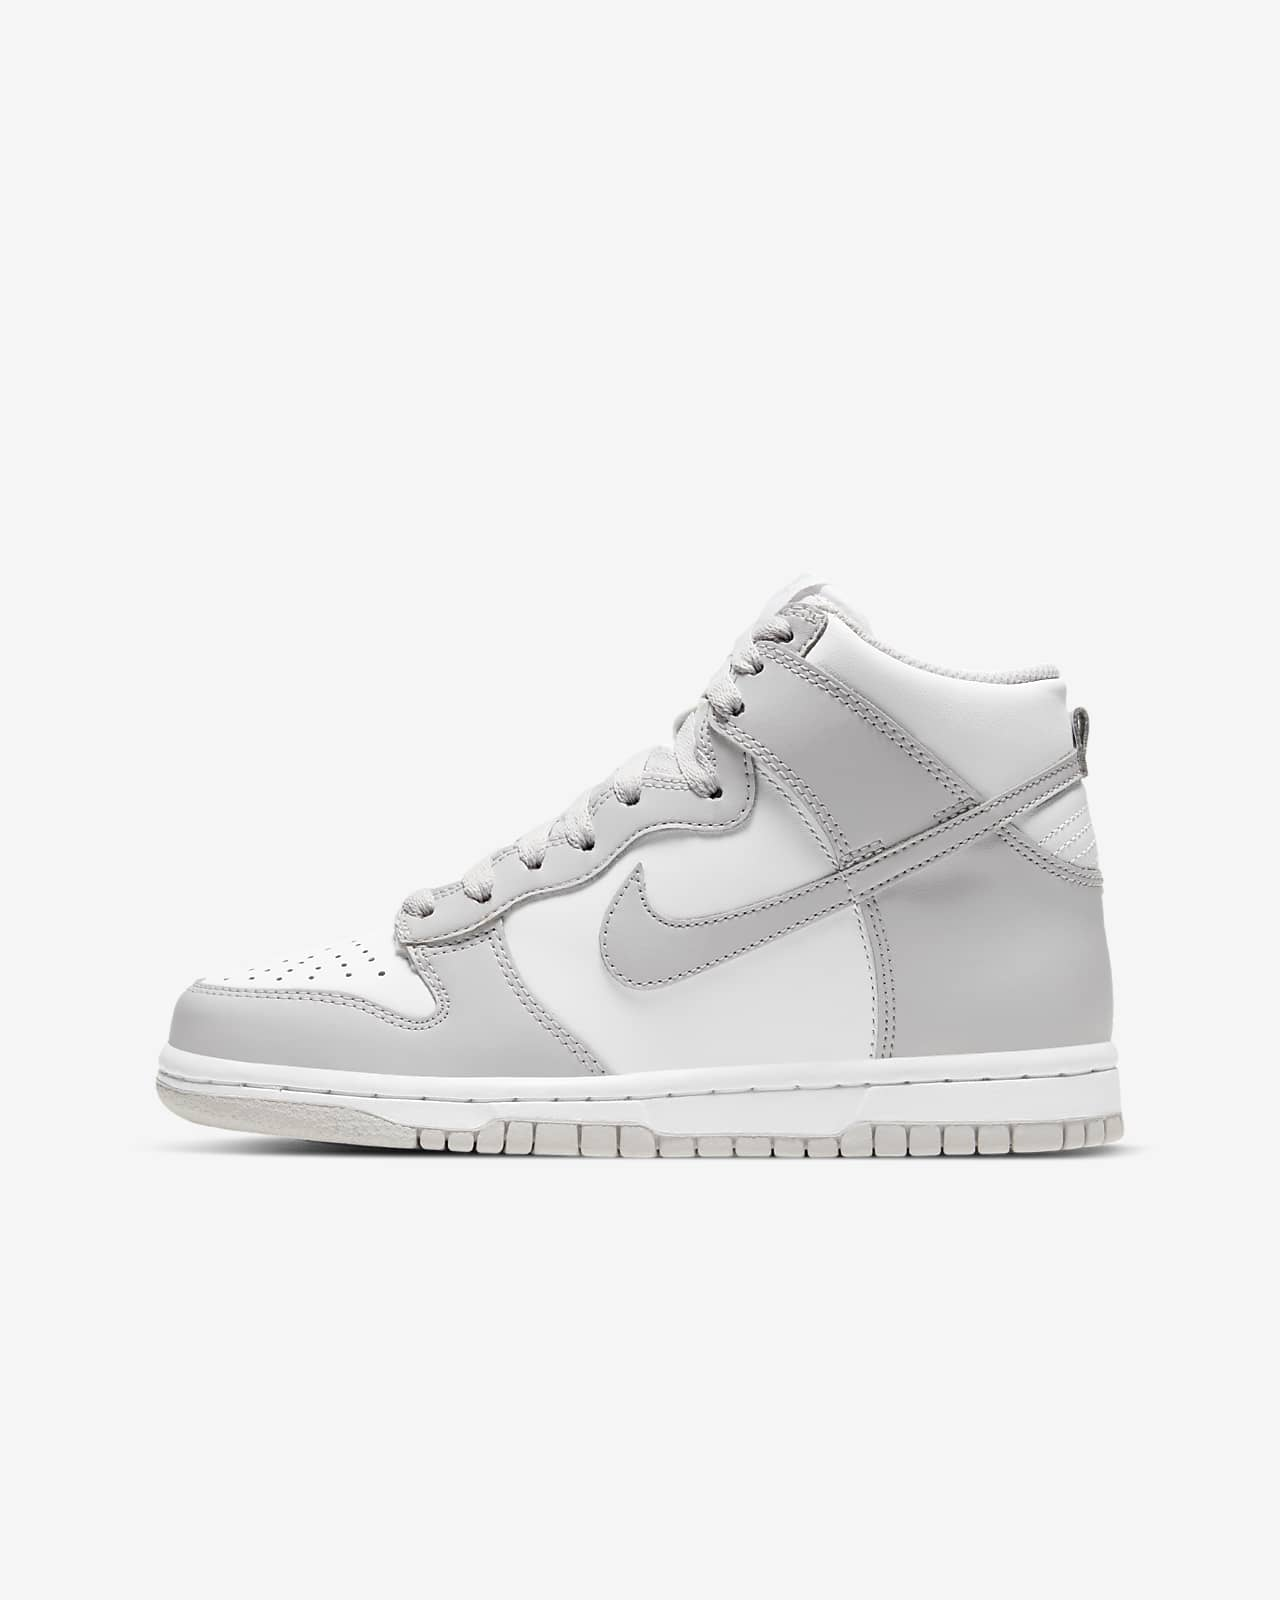 Nike Dunk High (GS) 大童运动童鞋